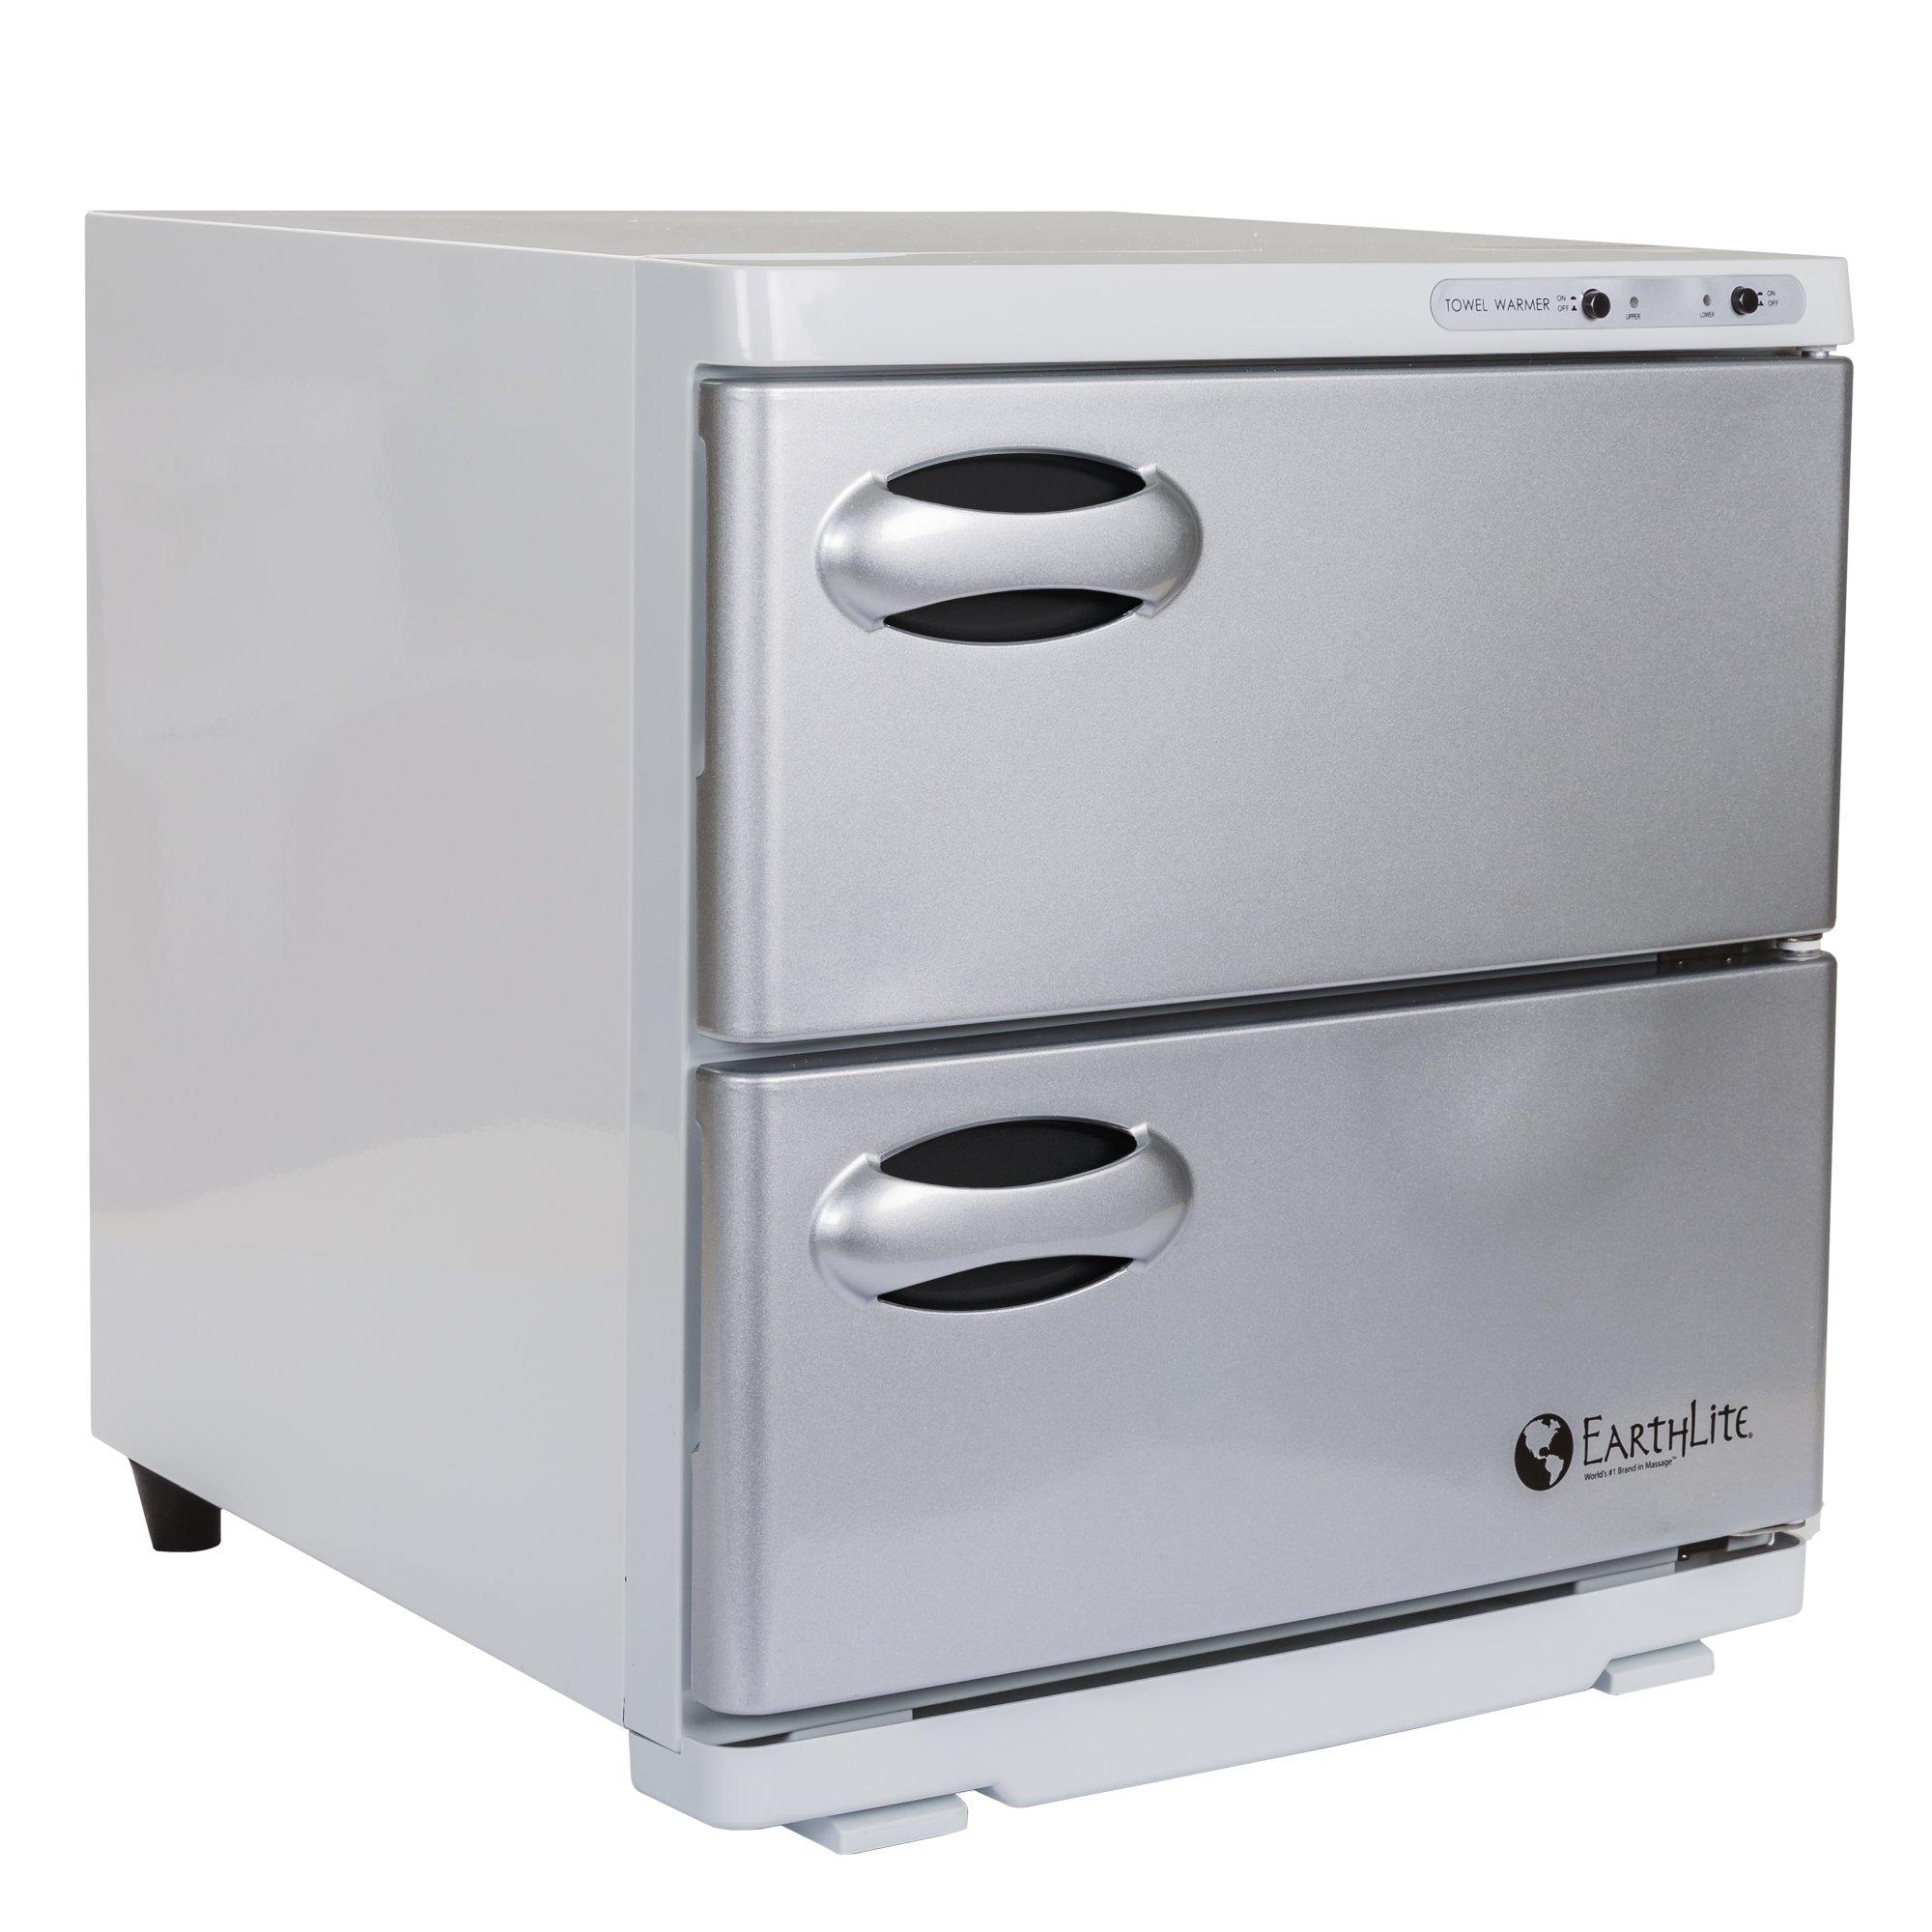 EARTHLITE Hot Towel Warmer Cabinet Dual – UV Sanitizing, UL Listed, Rust Proof Interior, Aluminum Door, Extra Hot, 1 Year Warranty (32L)